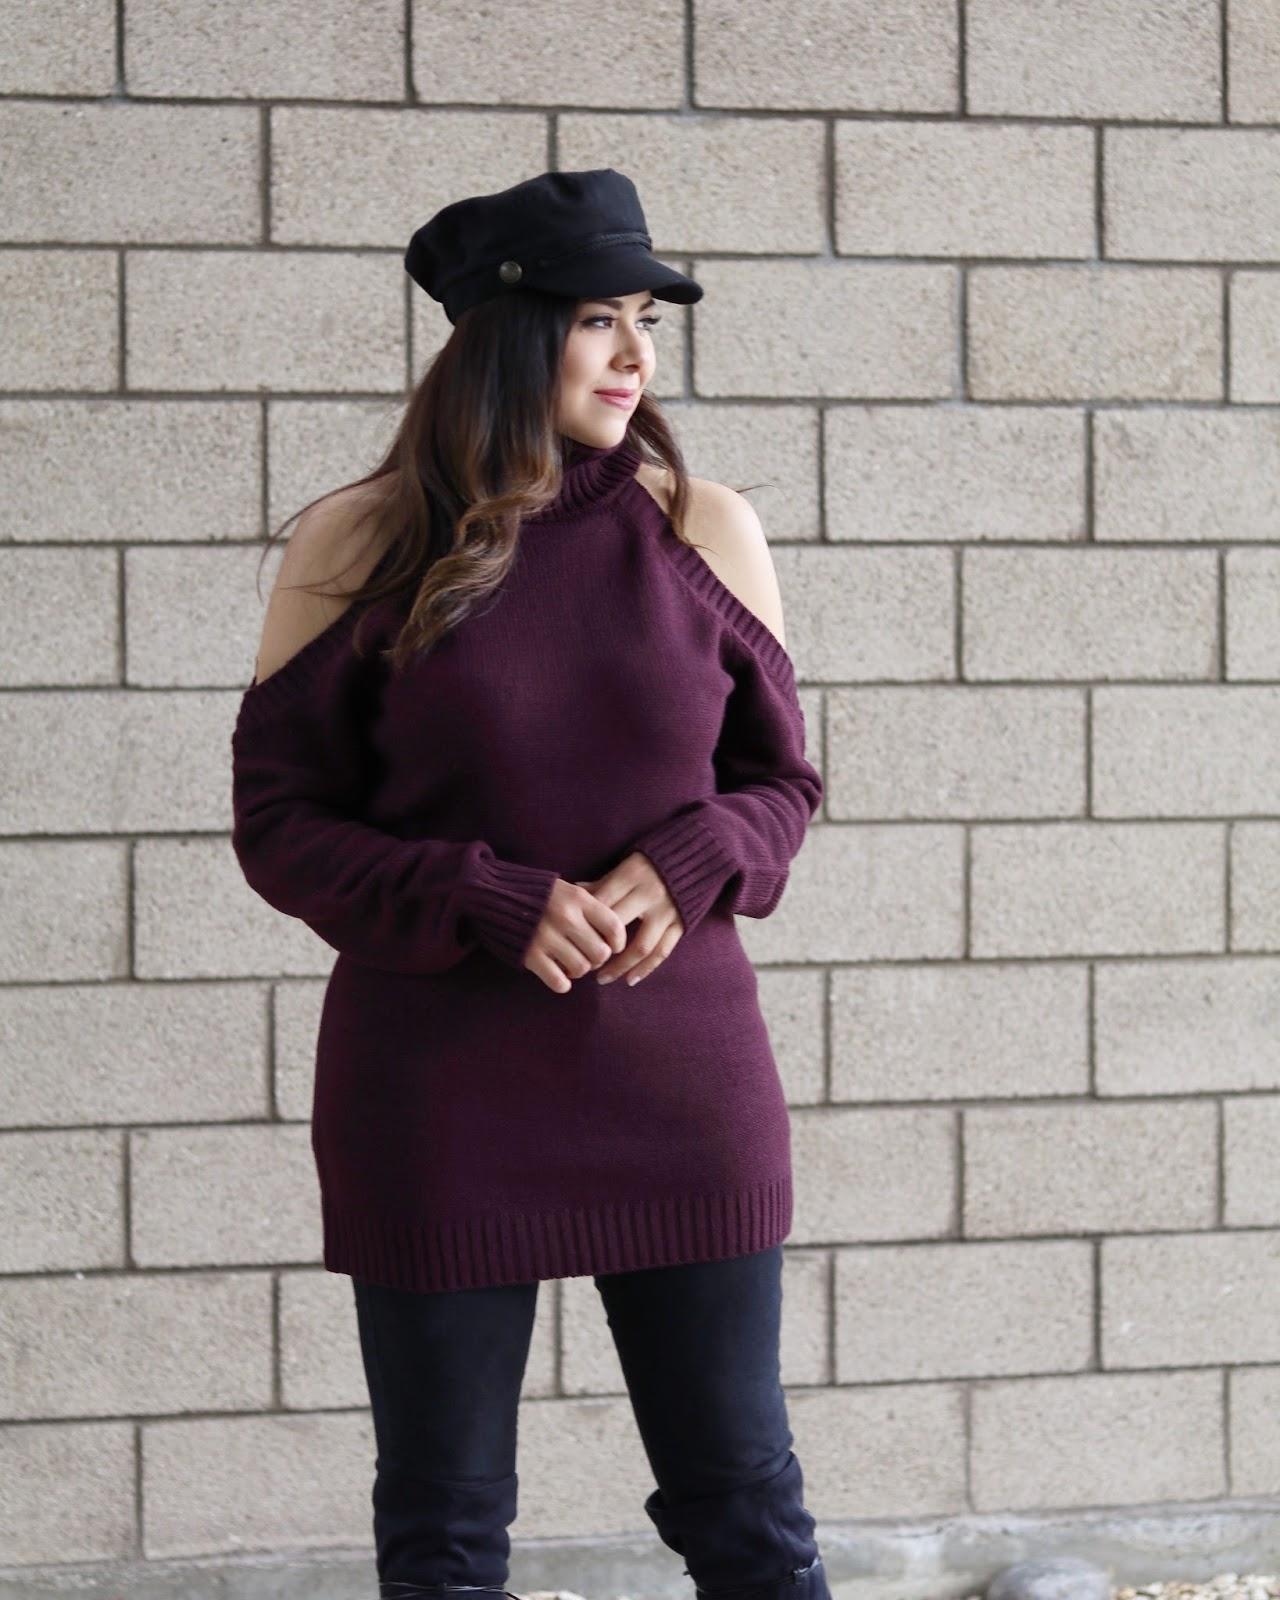 latina fashion blogger, mexican fashion blogger, latina style blogger